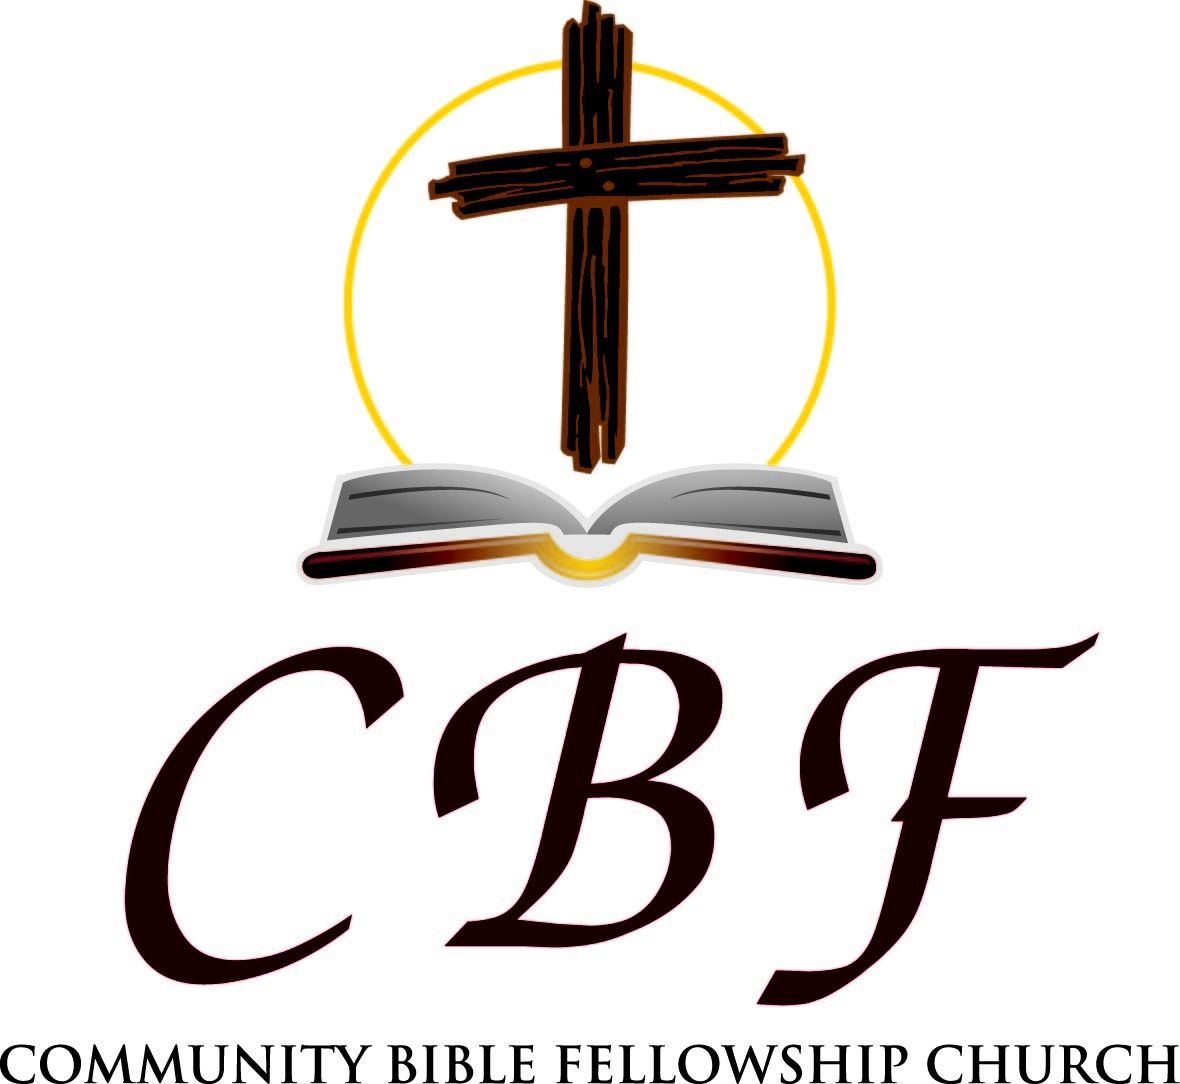 Community Bible Fellowship Church of Irving Bible Study